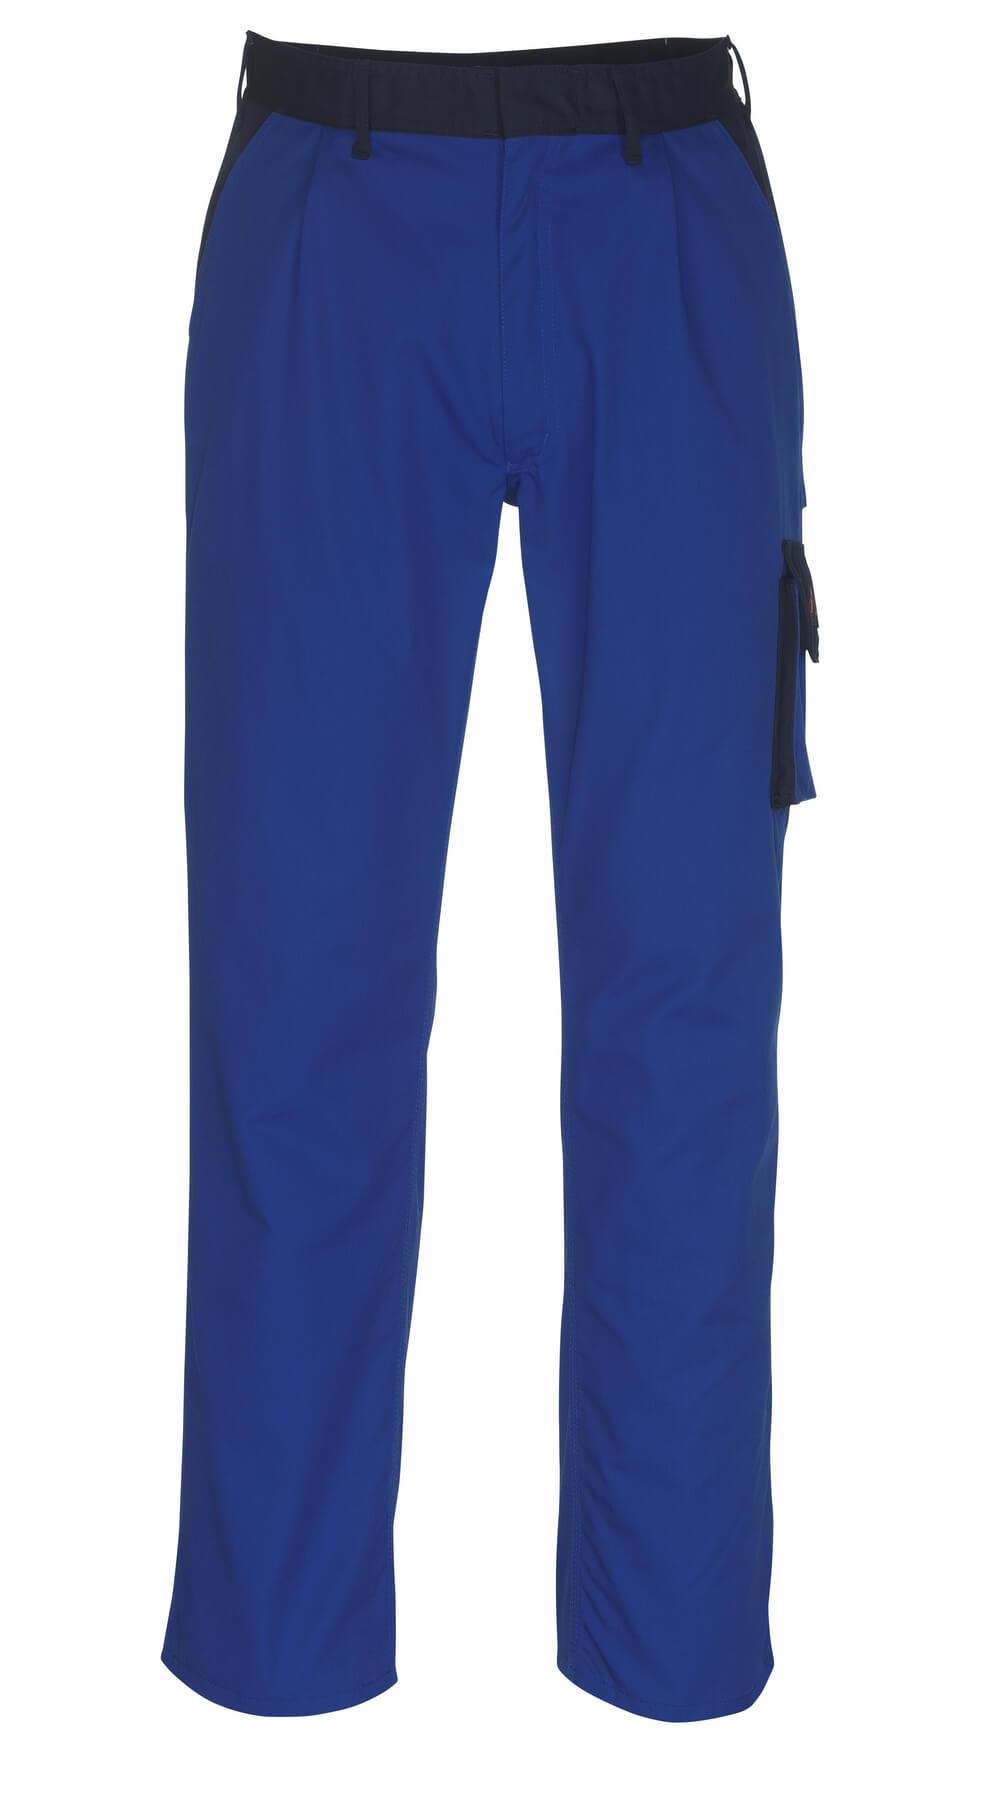 08779-442-1101 Pantaloni con tasche sulle cosce - blu royal/blu navy